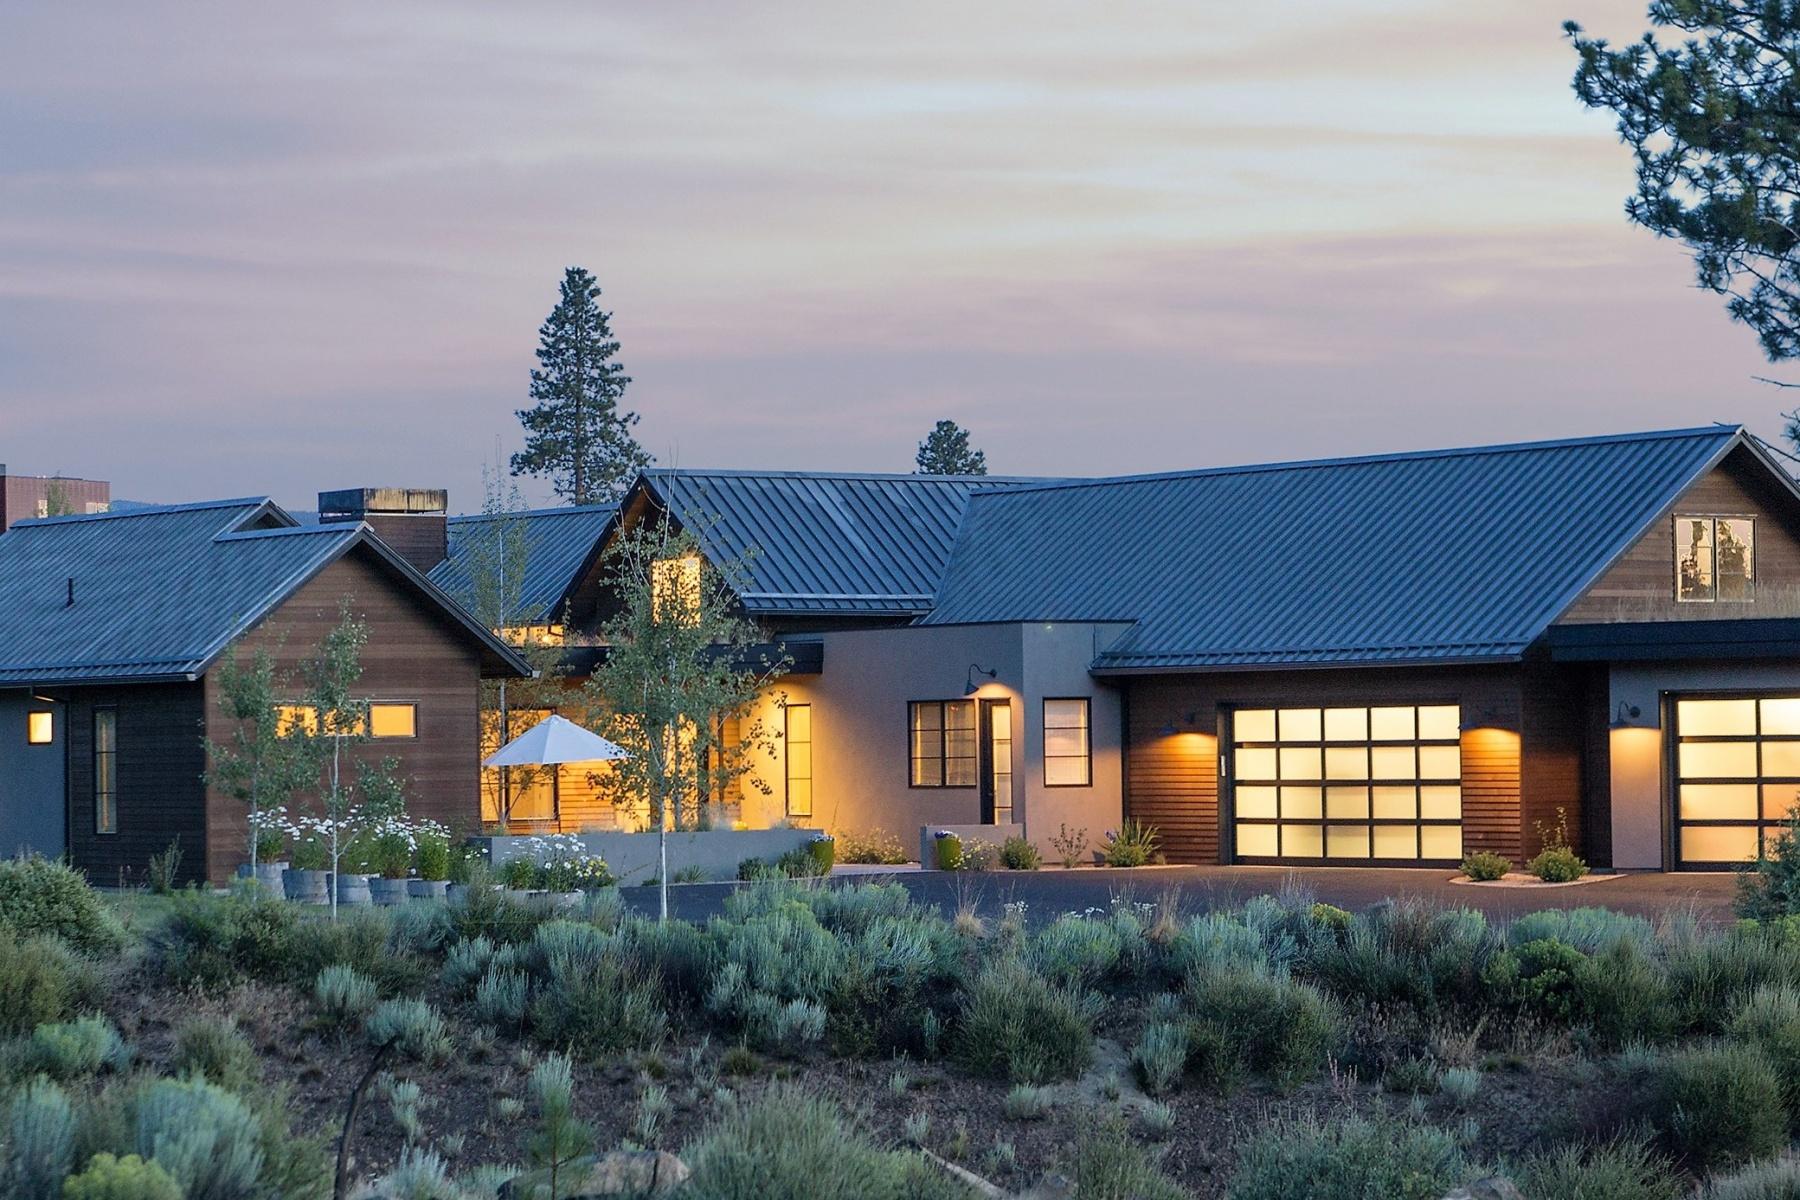 獨棟家庭住宅 為 出售 在 Modern High Desert Estate - Tetherow 61451 Hackleman Ct Bend, 俄勒岡州, 97702 美國